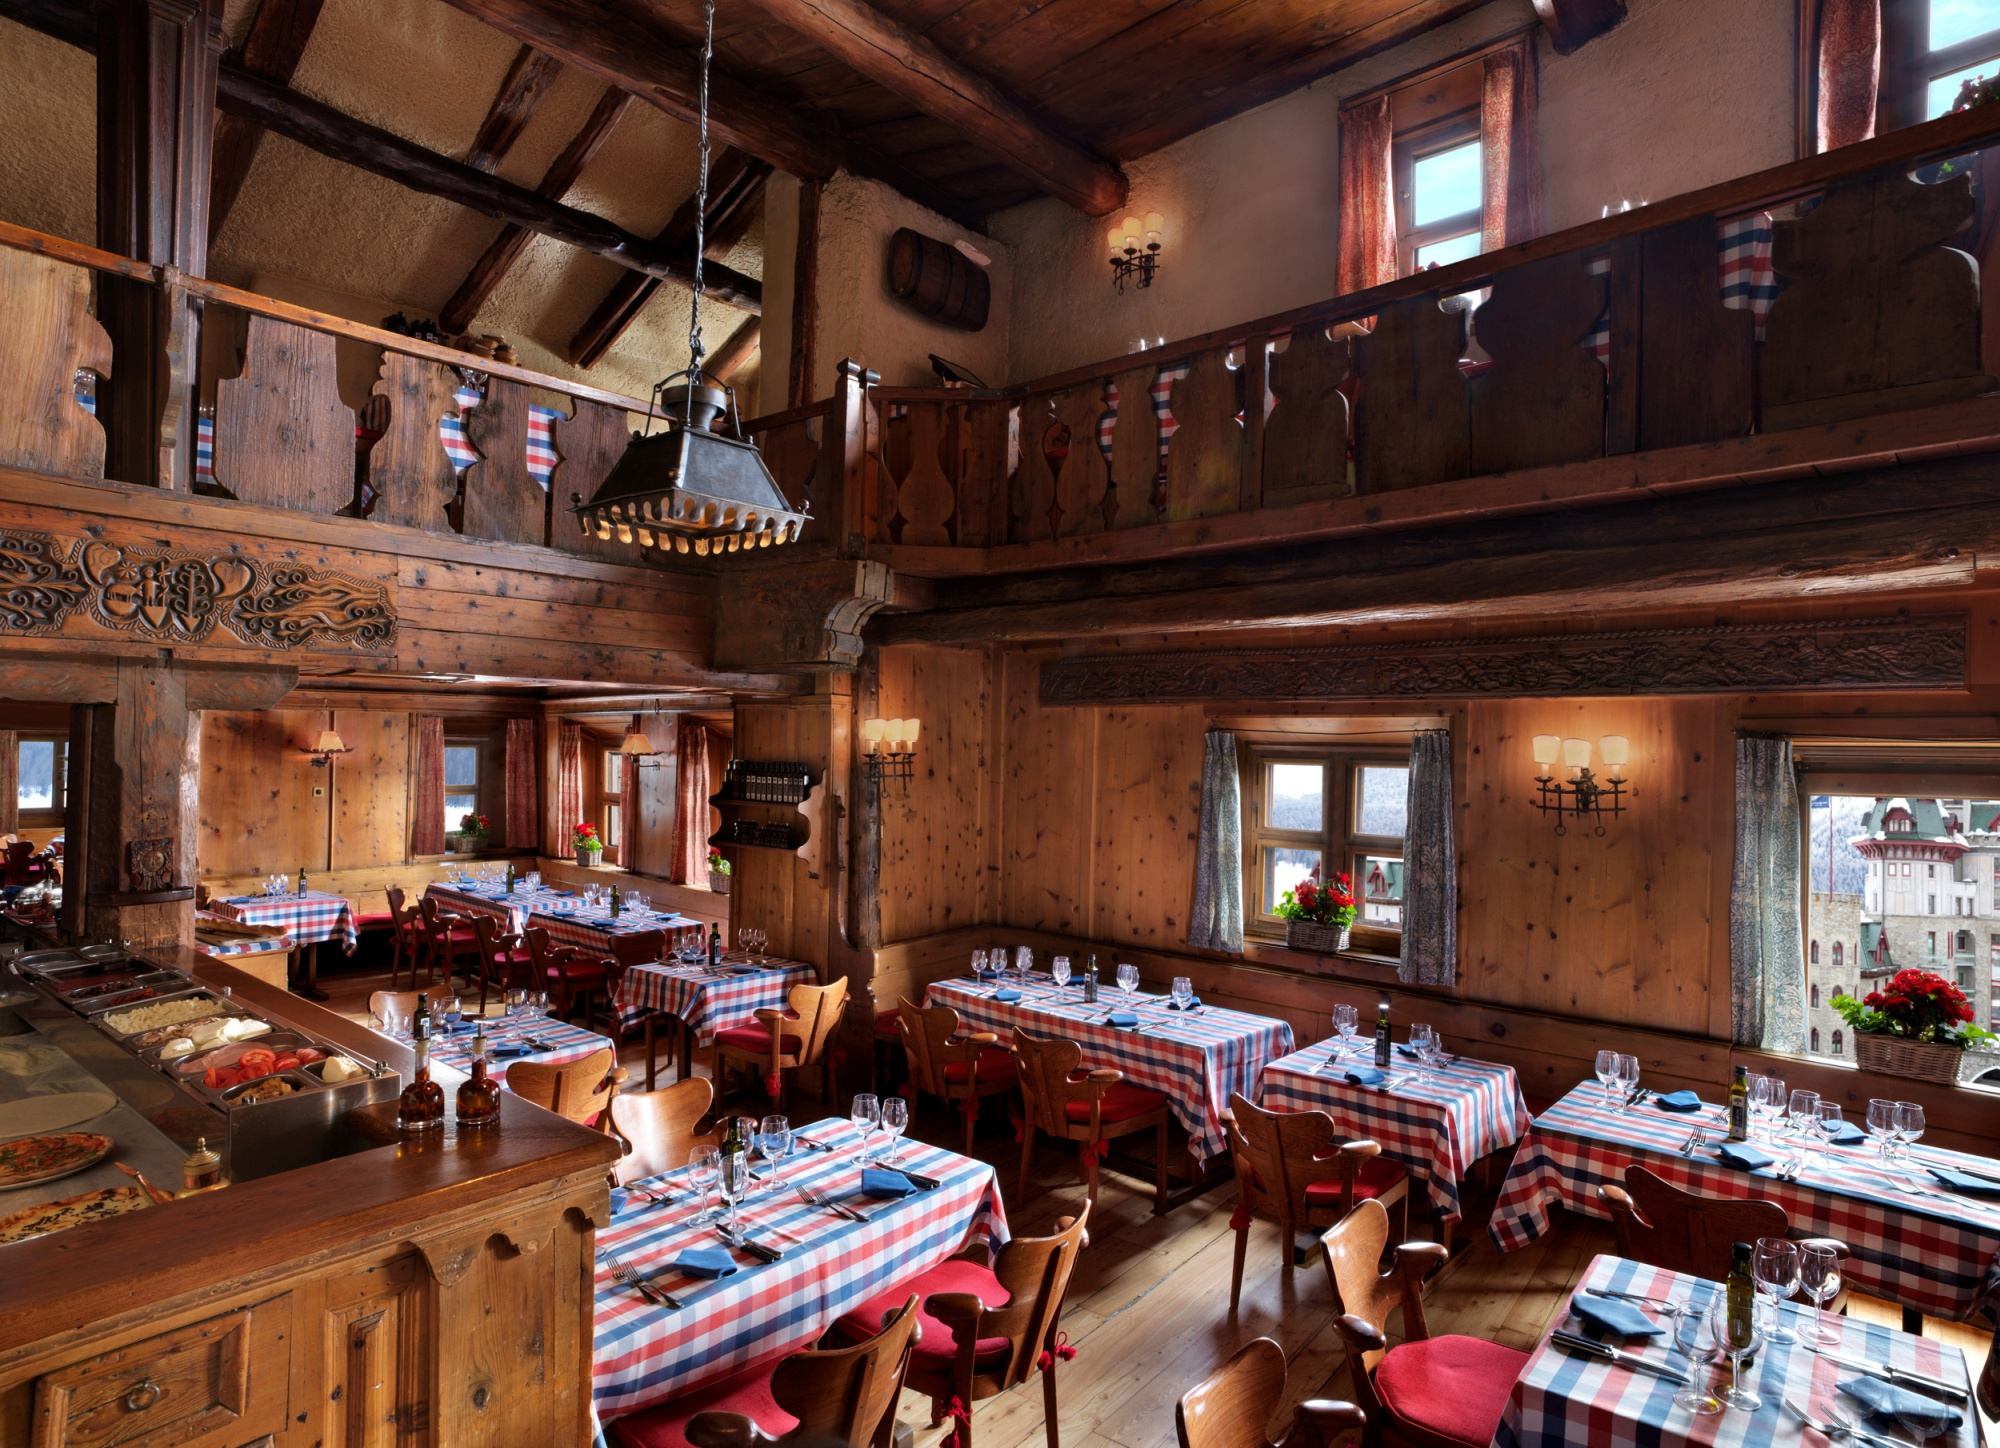 Badrutt's Palace Hotel - St. Moritz's Landmark Hotel